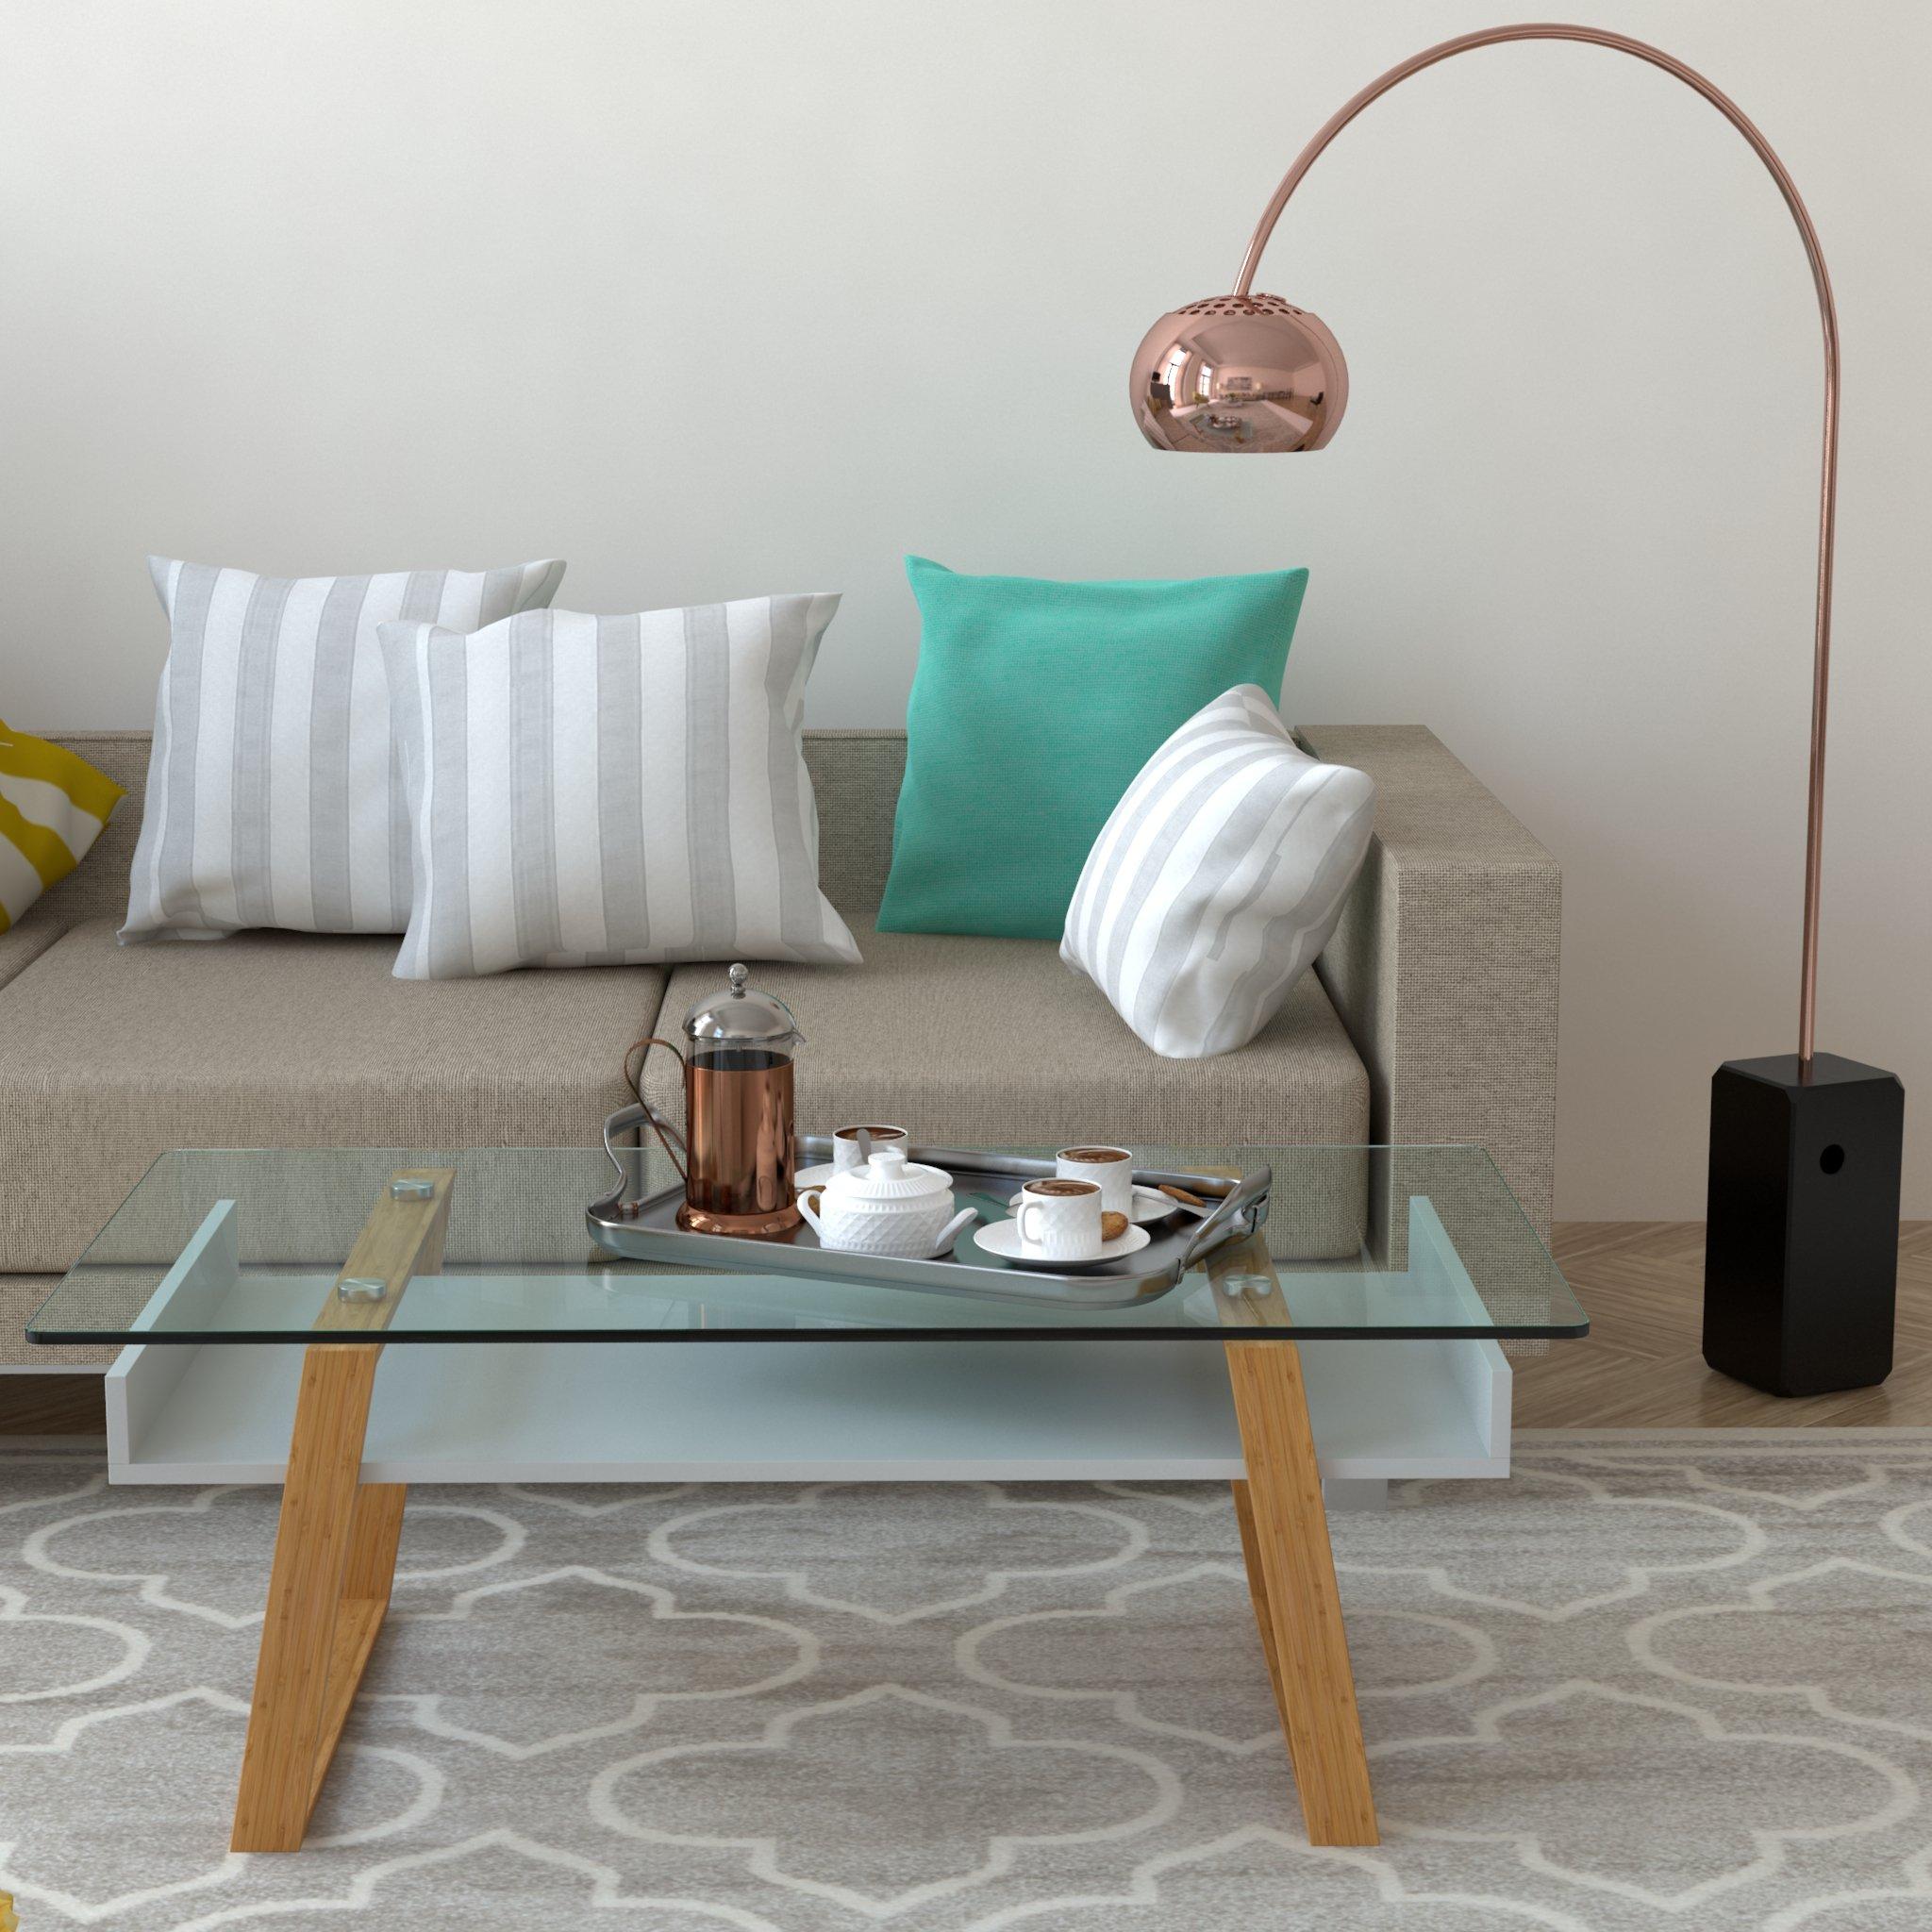 livingroom egg wonderful nautical table diy deviled coffee couch room ideas pinterest set likable living center sofa platter